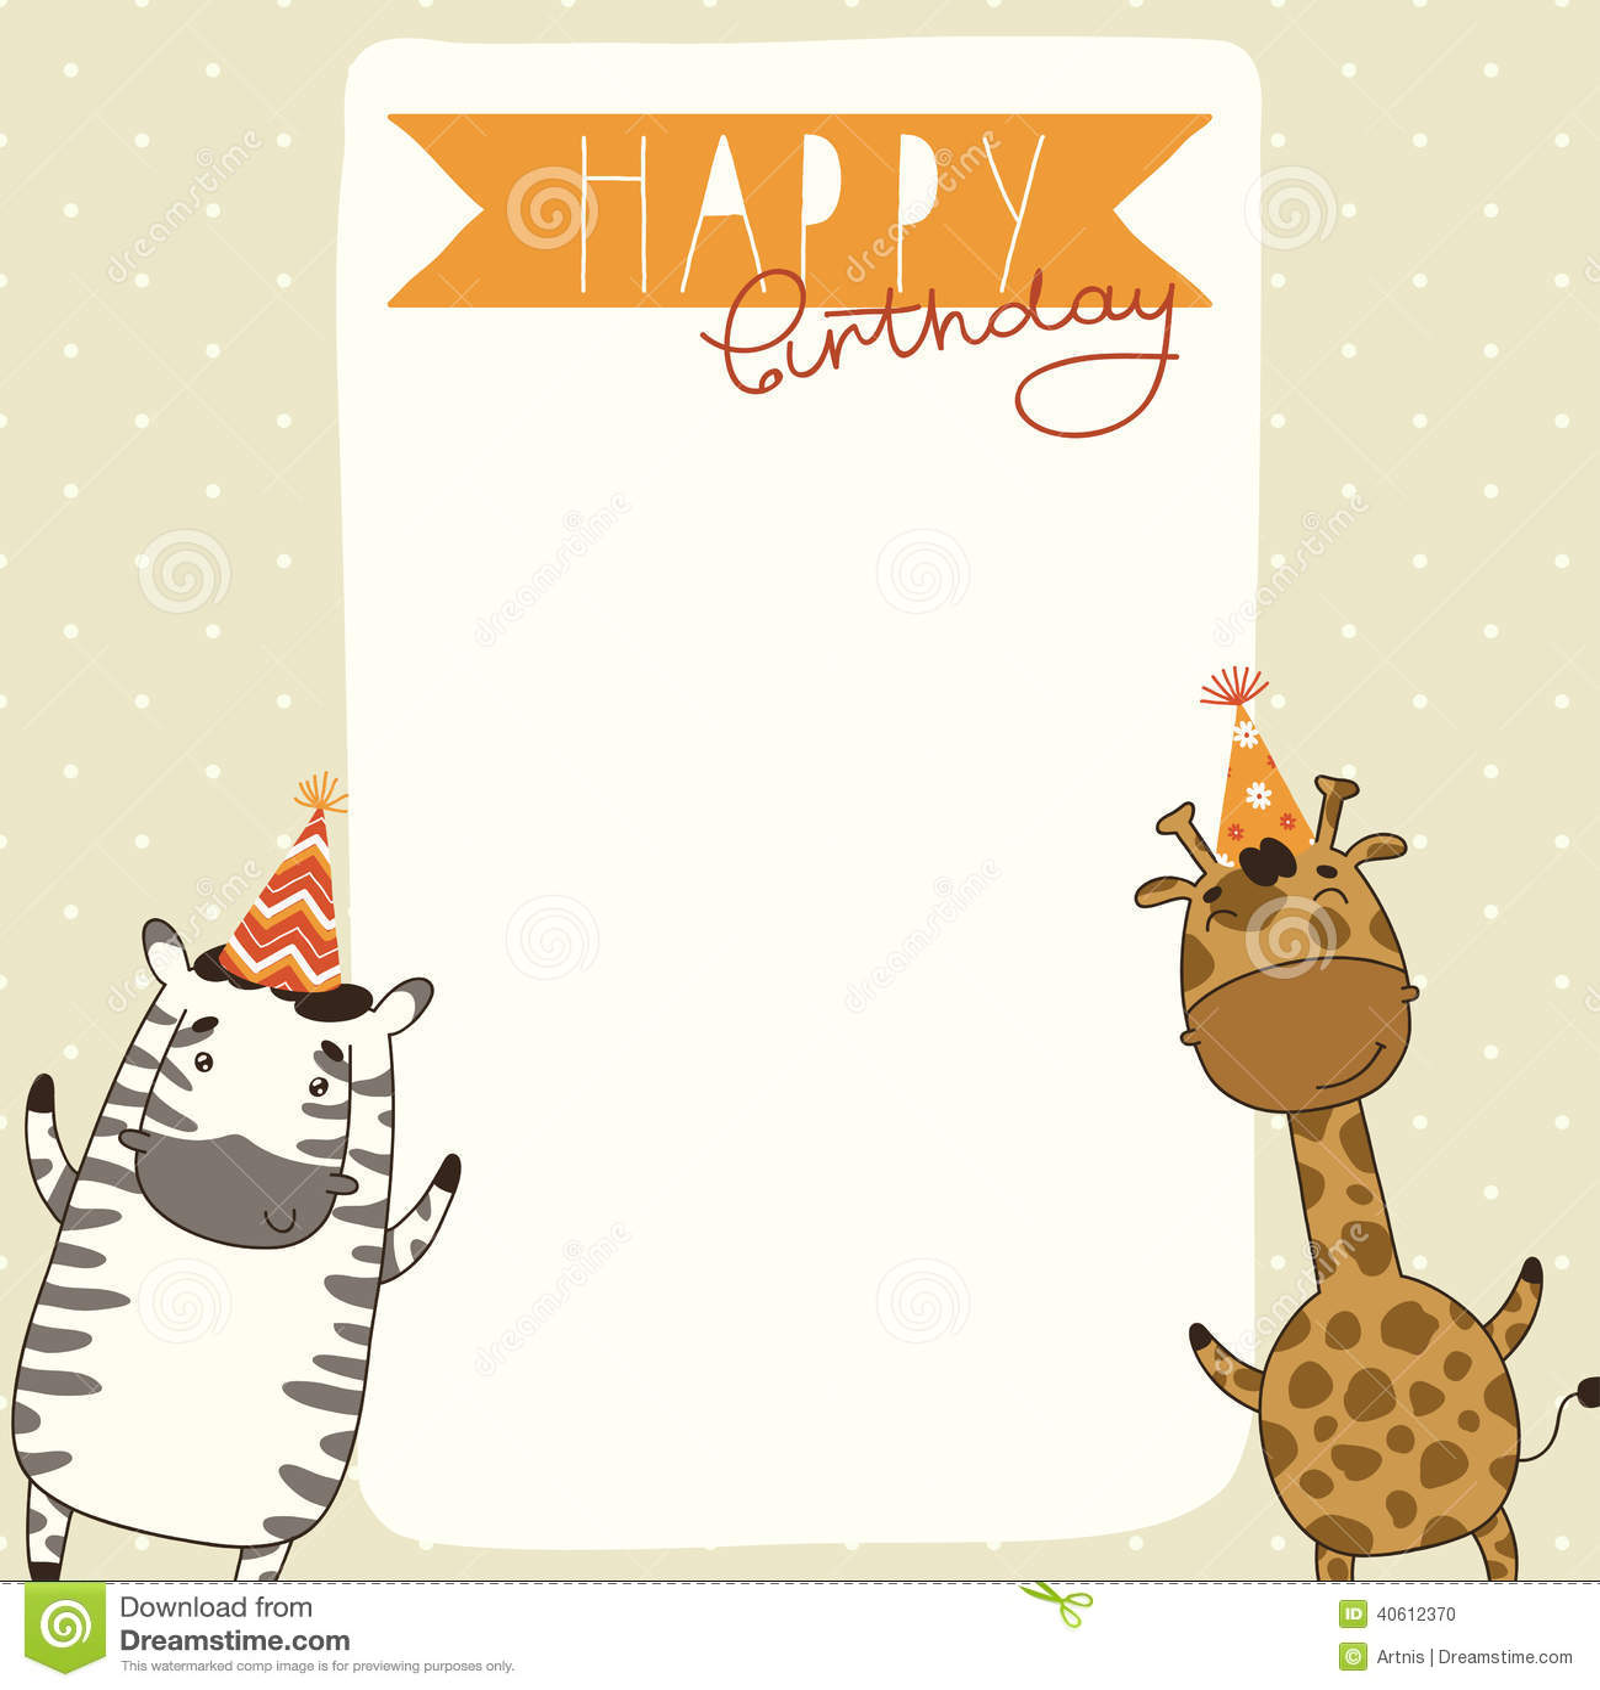 Happy Birthday Card Background With Zebra And Giraffe Stock Vector